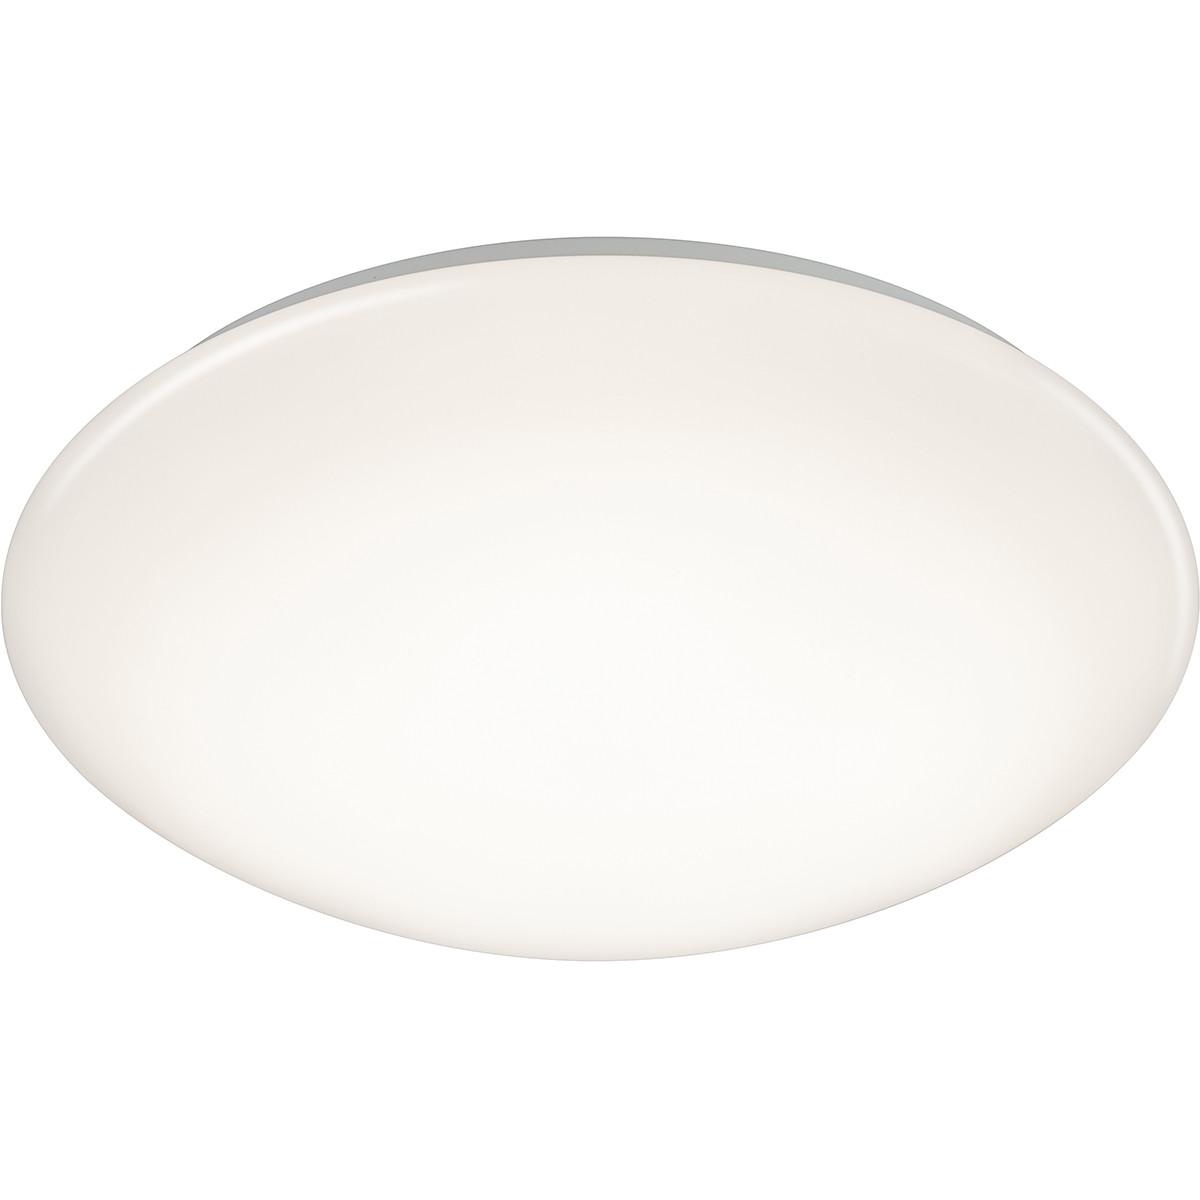 LED Plafondlamp met Bewegingssensor - Trion Poly - Opbouw Rond 12W - Spatwaterdicht IP44 - Warm Wit